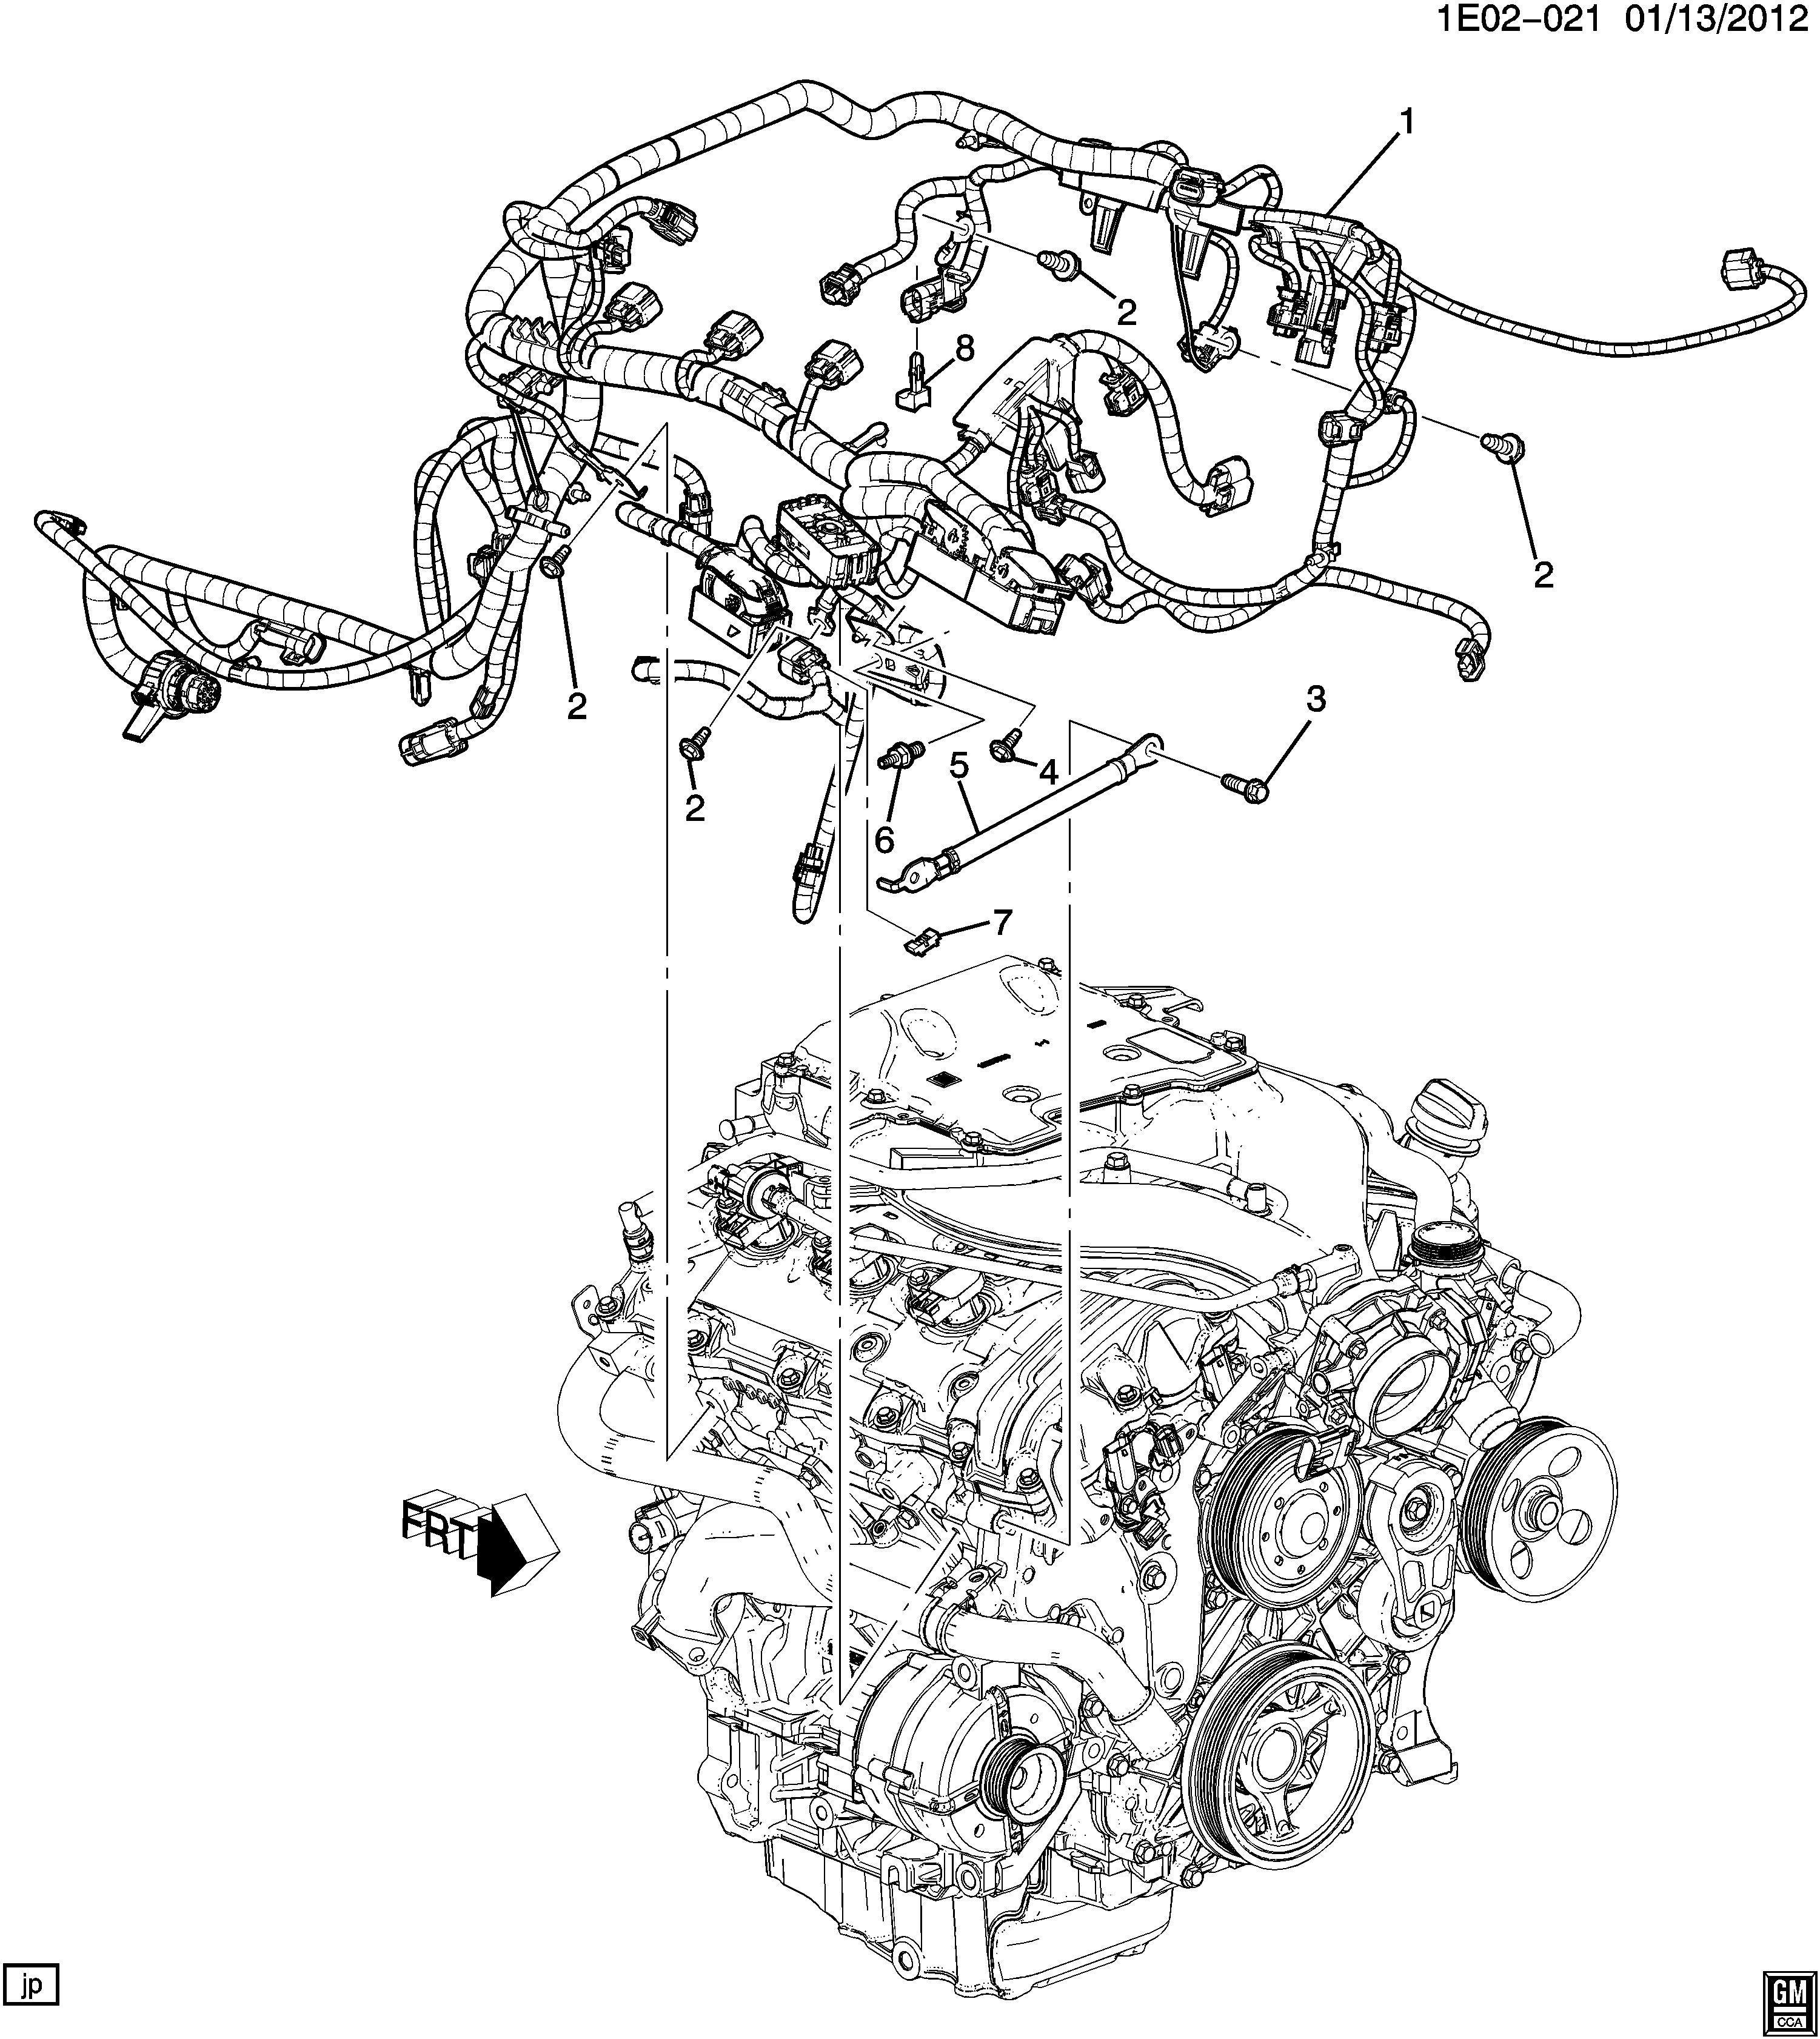 2010 Chevrolet Camaro Engine Wiring Harness  3 6 Liter  Auto Trans  Transmyb